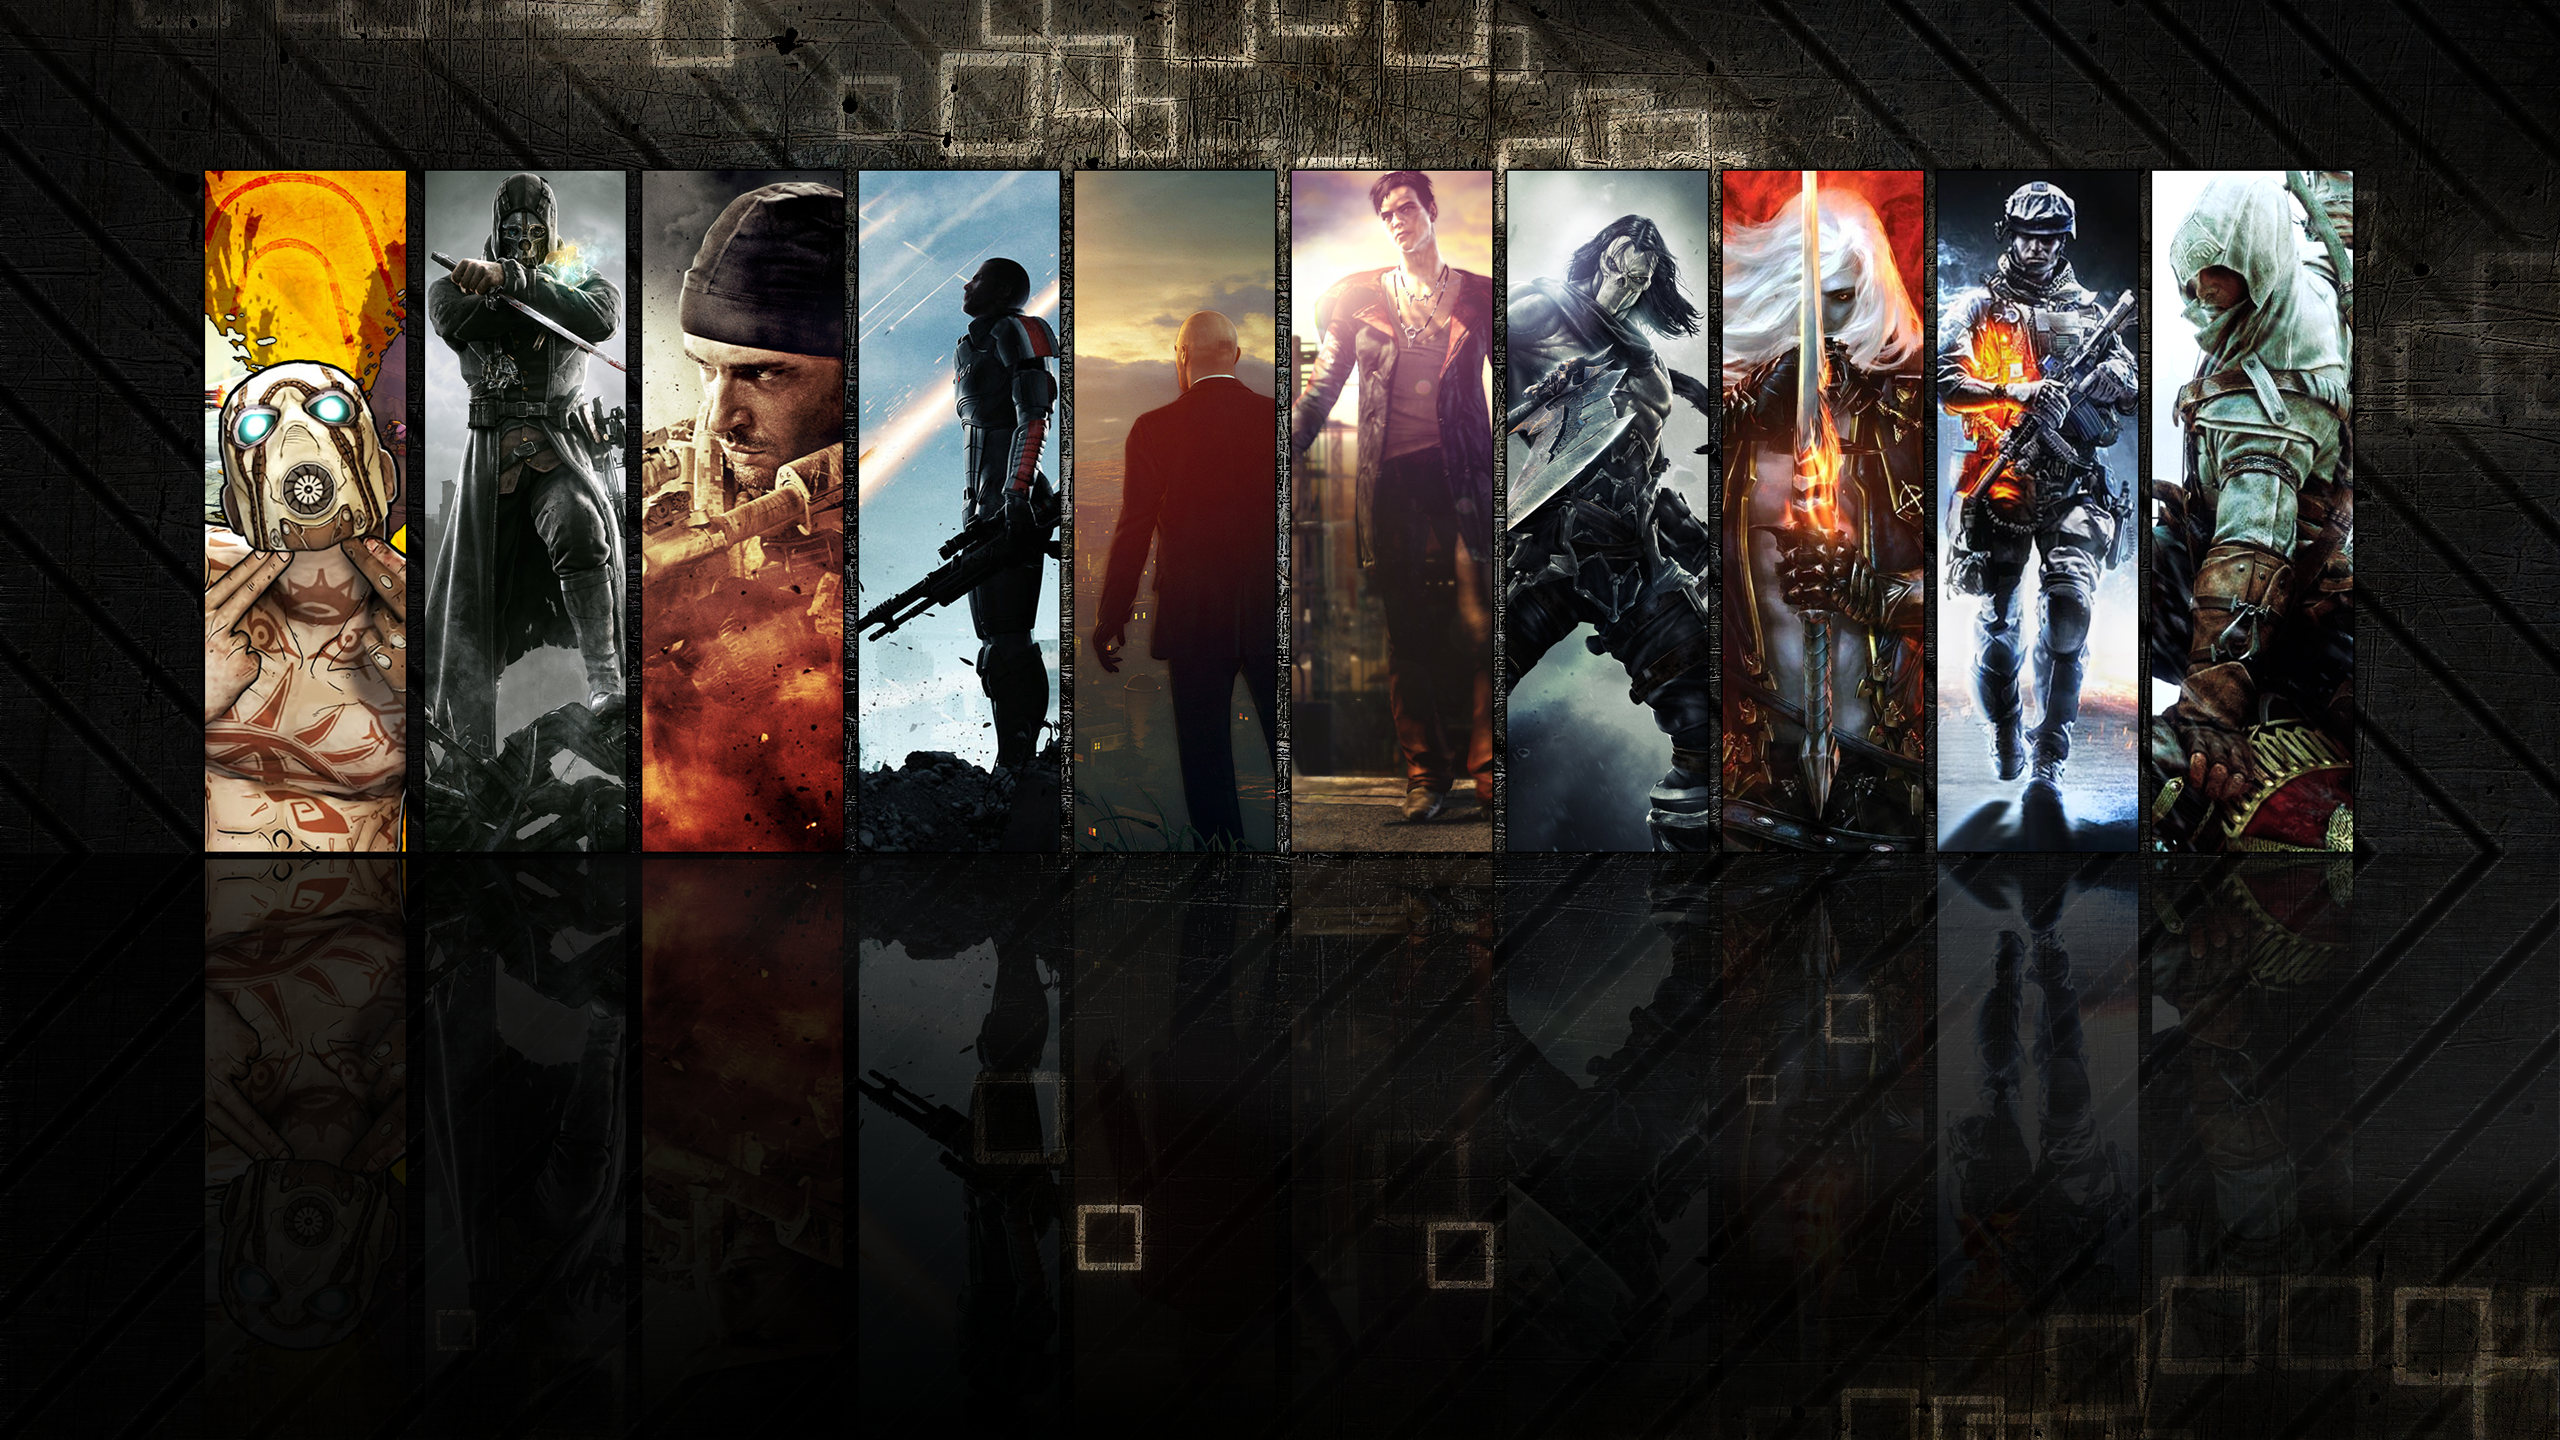 Video Game Wallpaper Hd Video Games Wallpaper Adorable - 2560 X 1440 Games , HD Wallpaper & Backgrounds